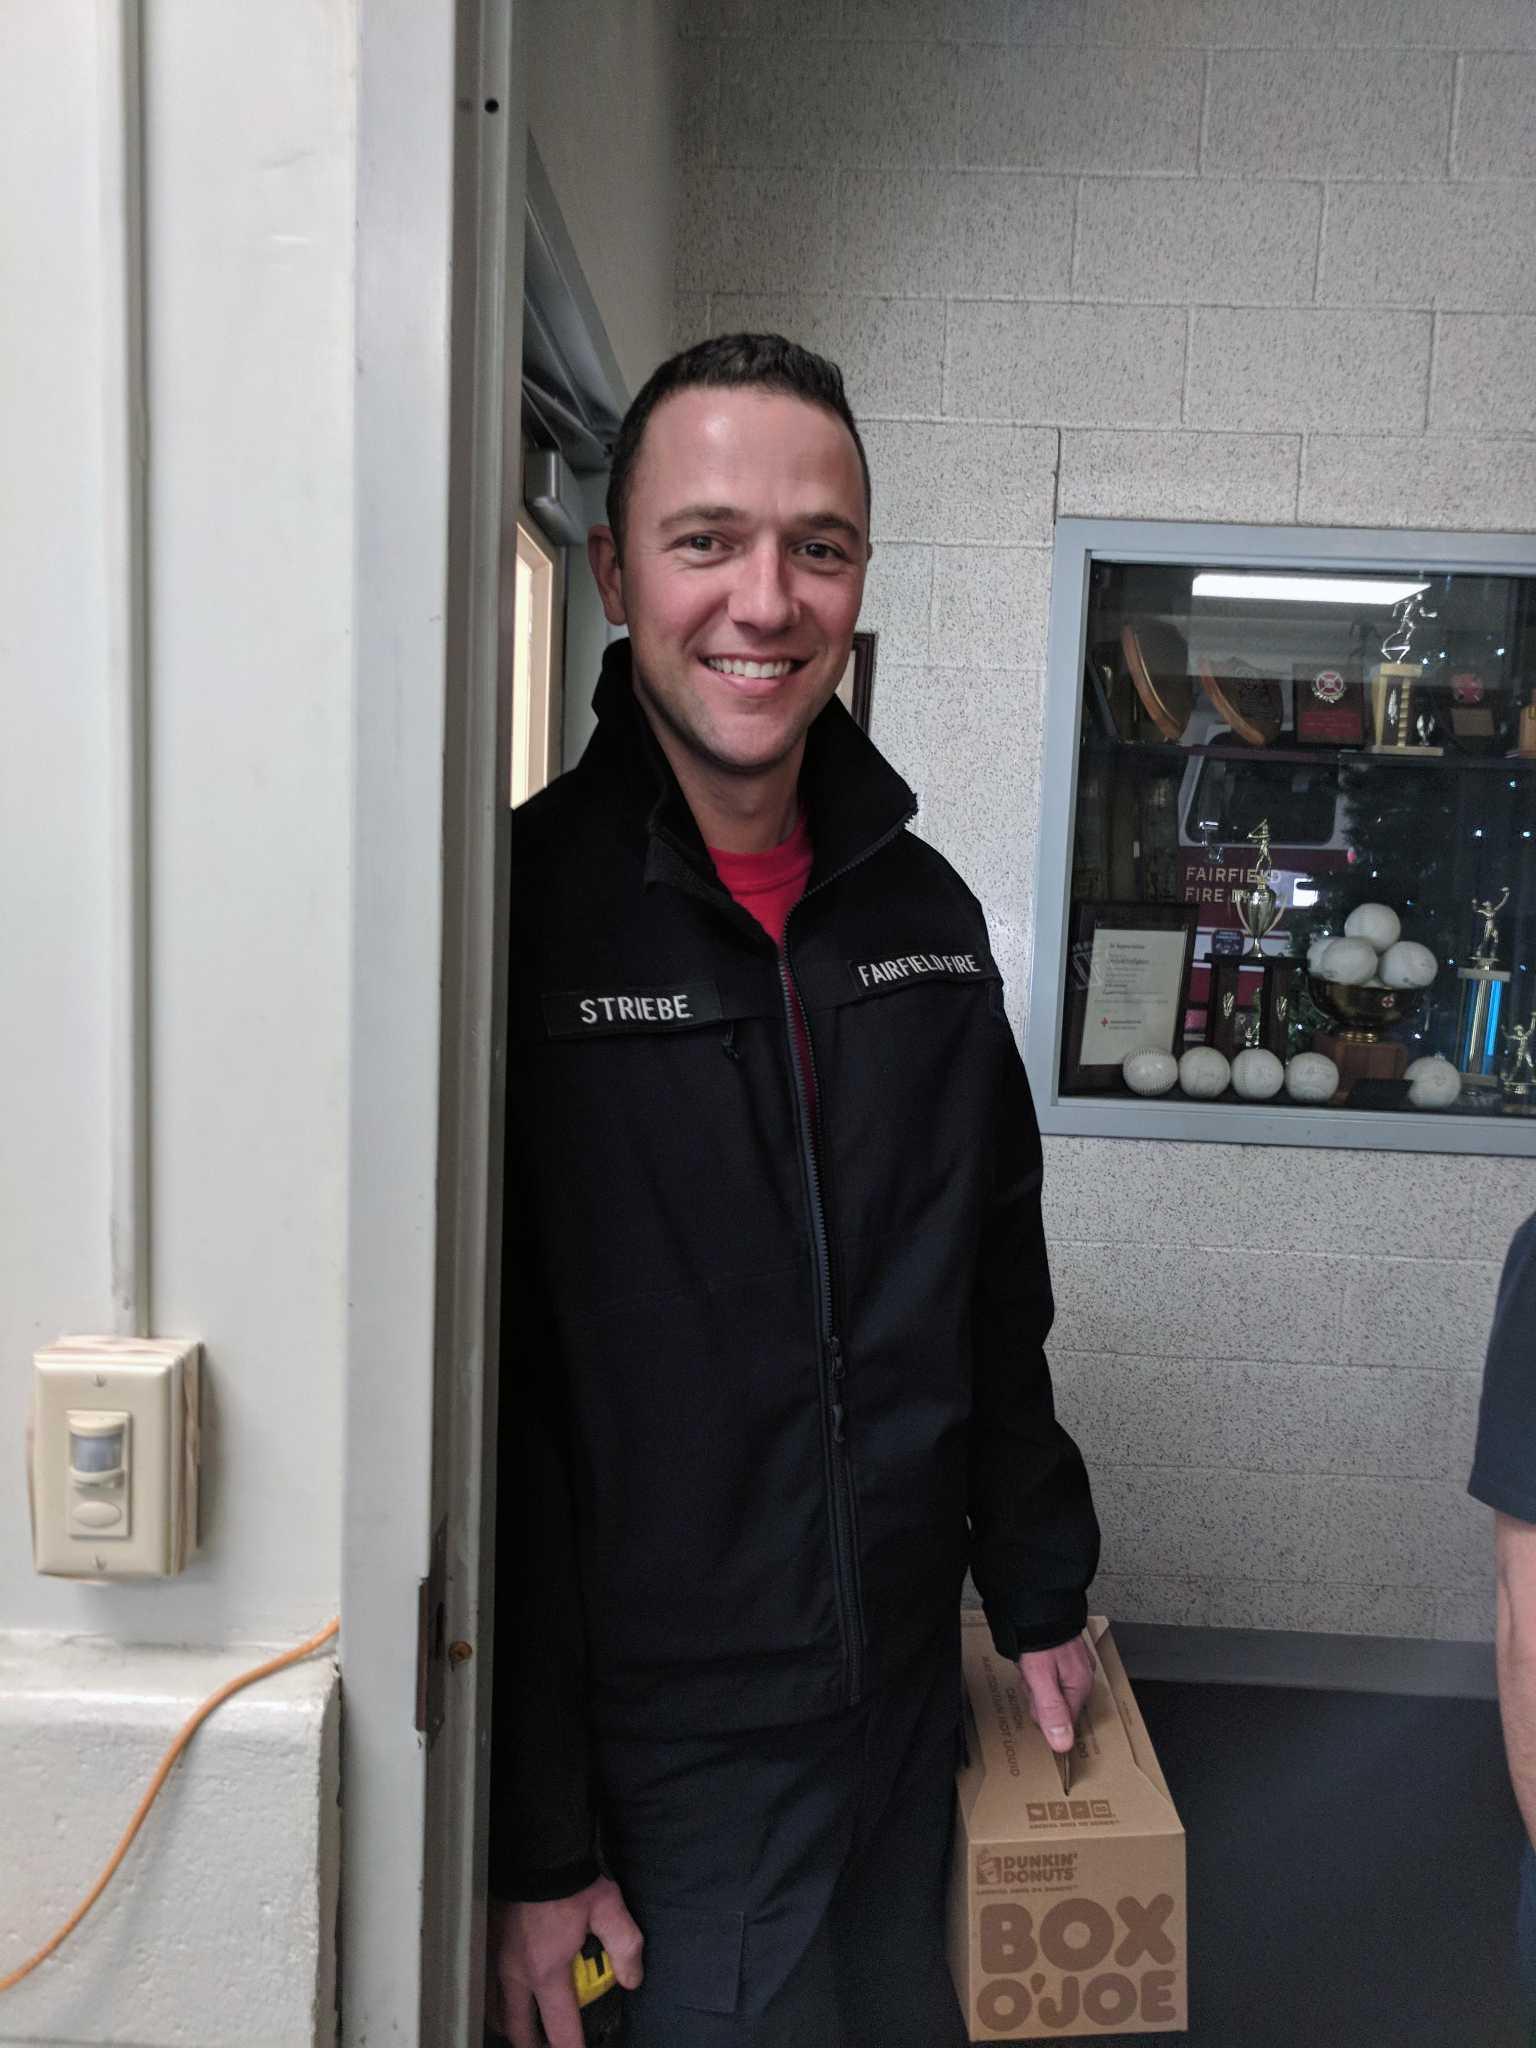 Colleges In Ct >> Fairfield firefighter, Matt Striebe a cat saving hero - Connecticut Post